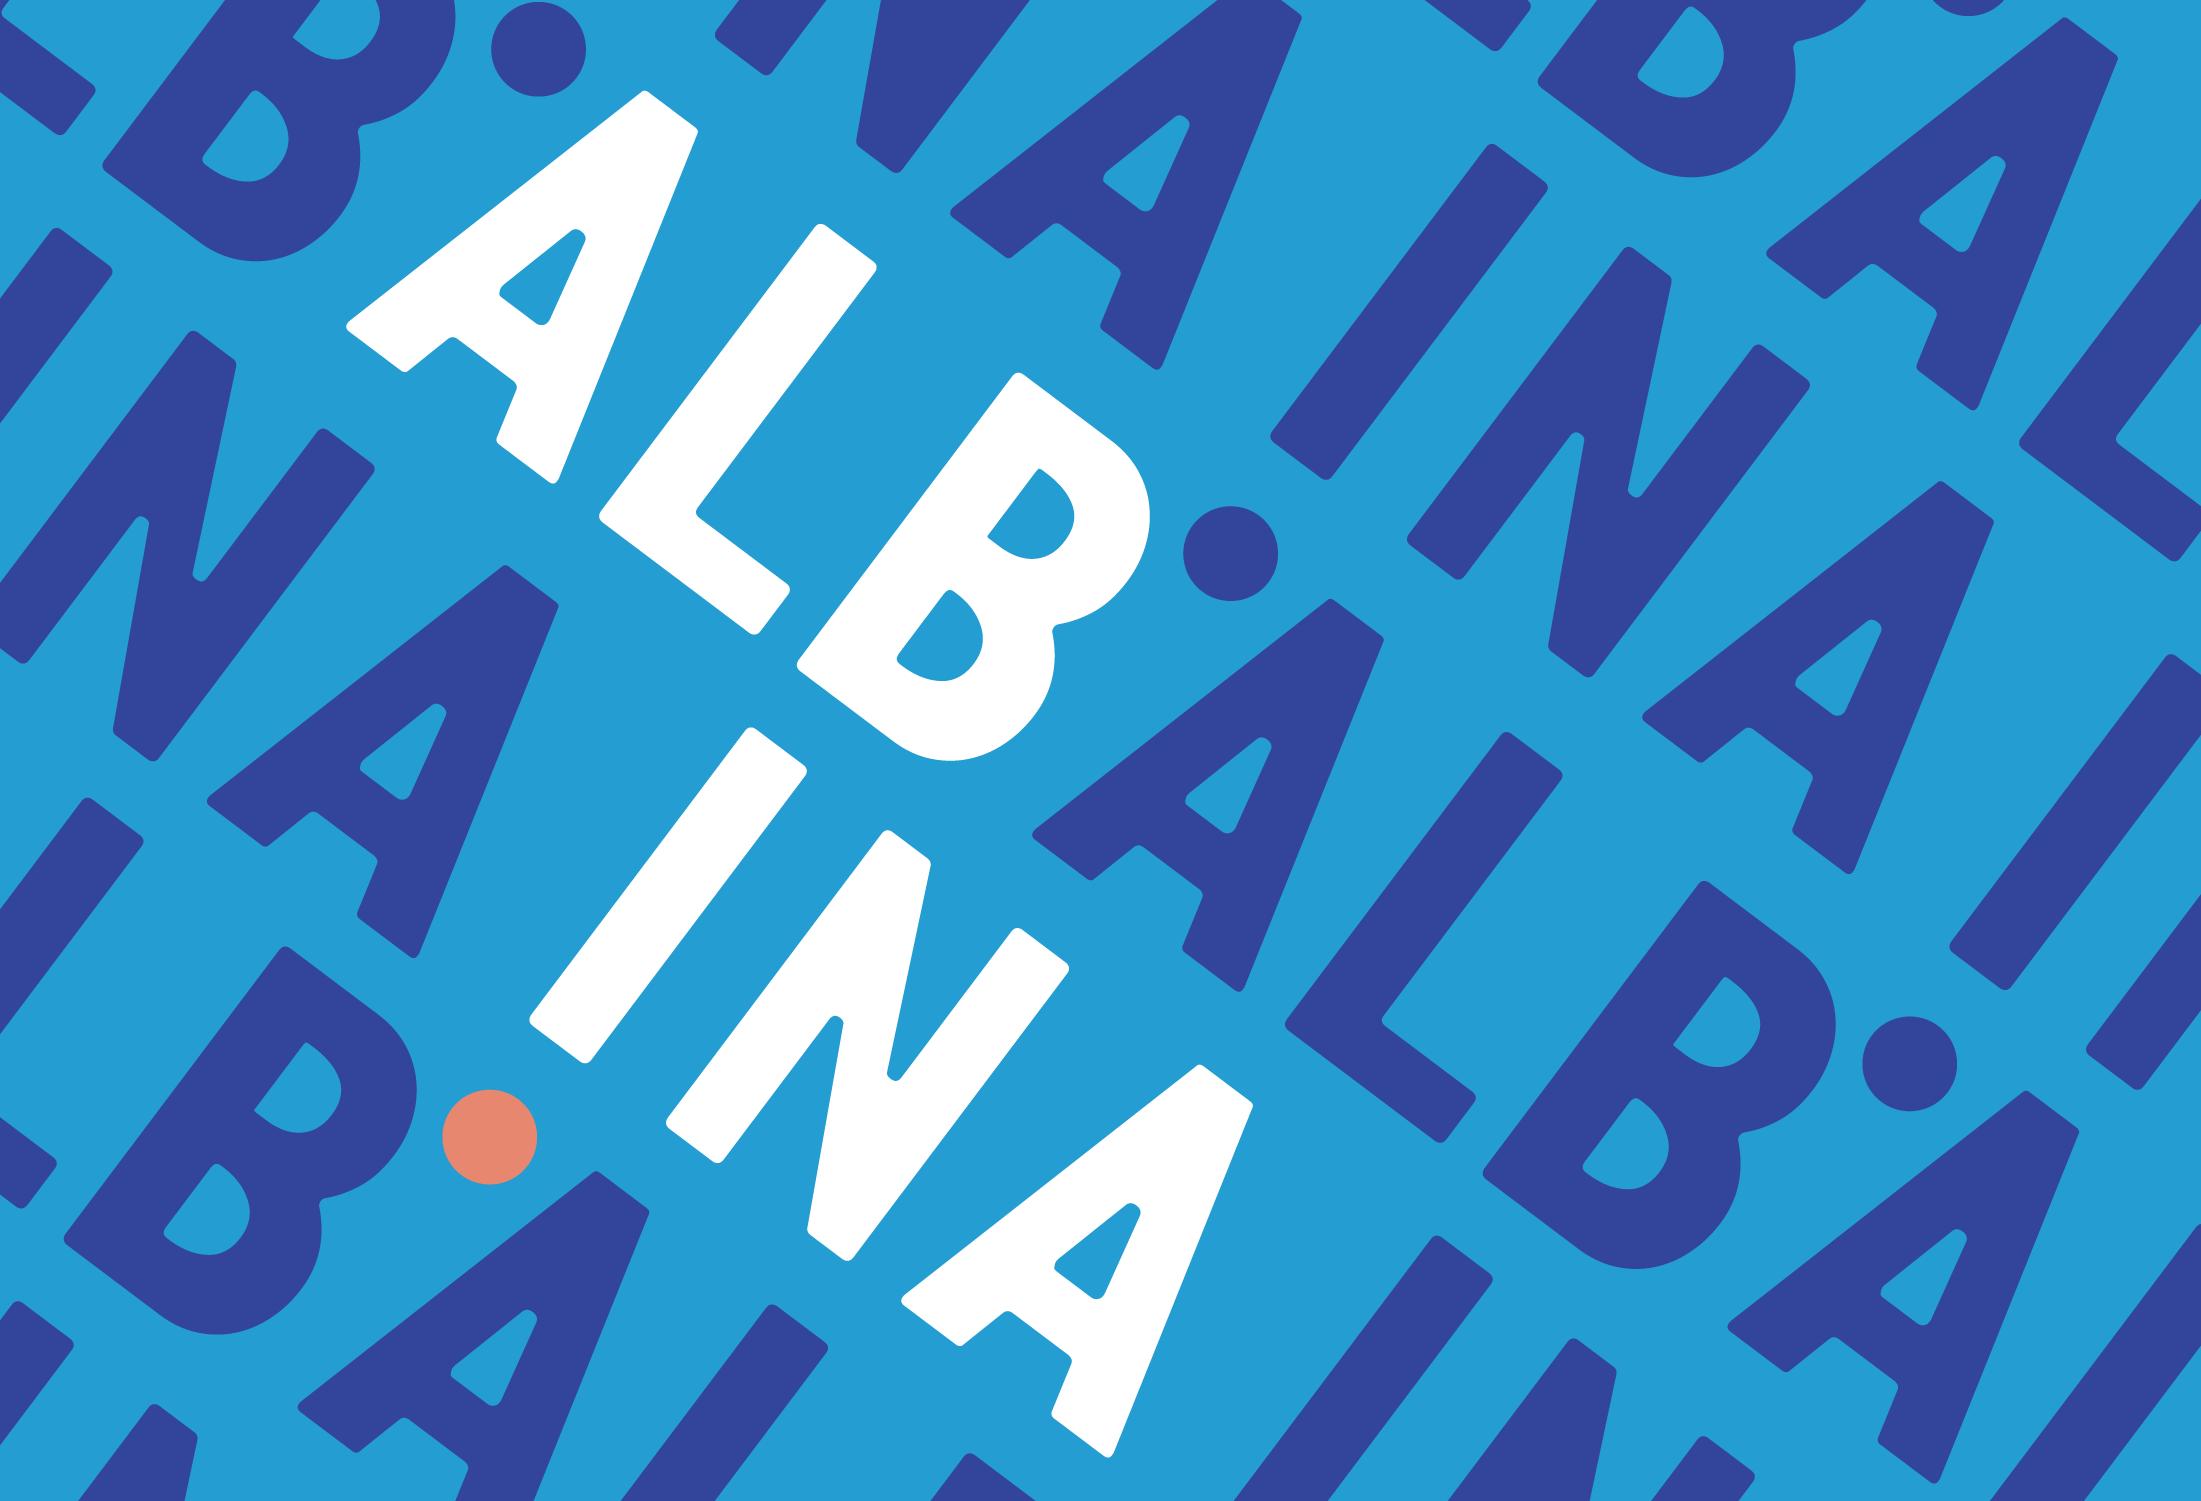 Albina_Repeat_Thumb